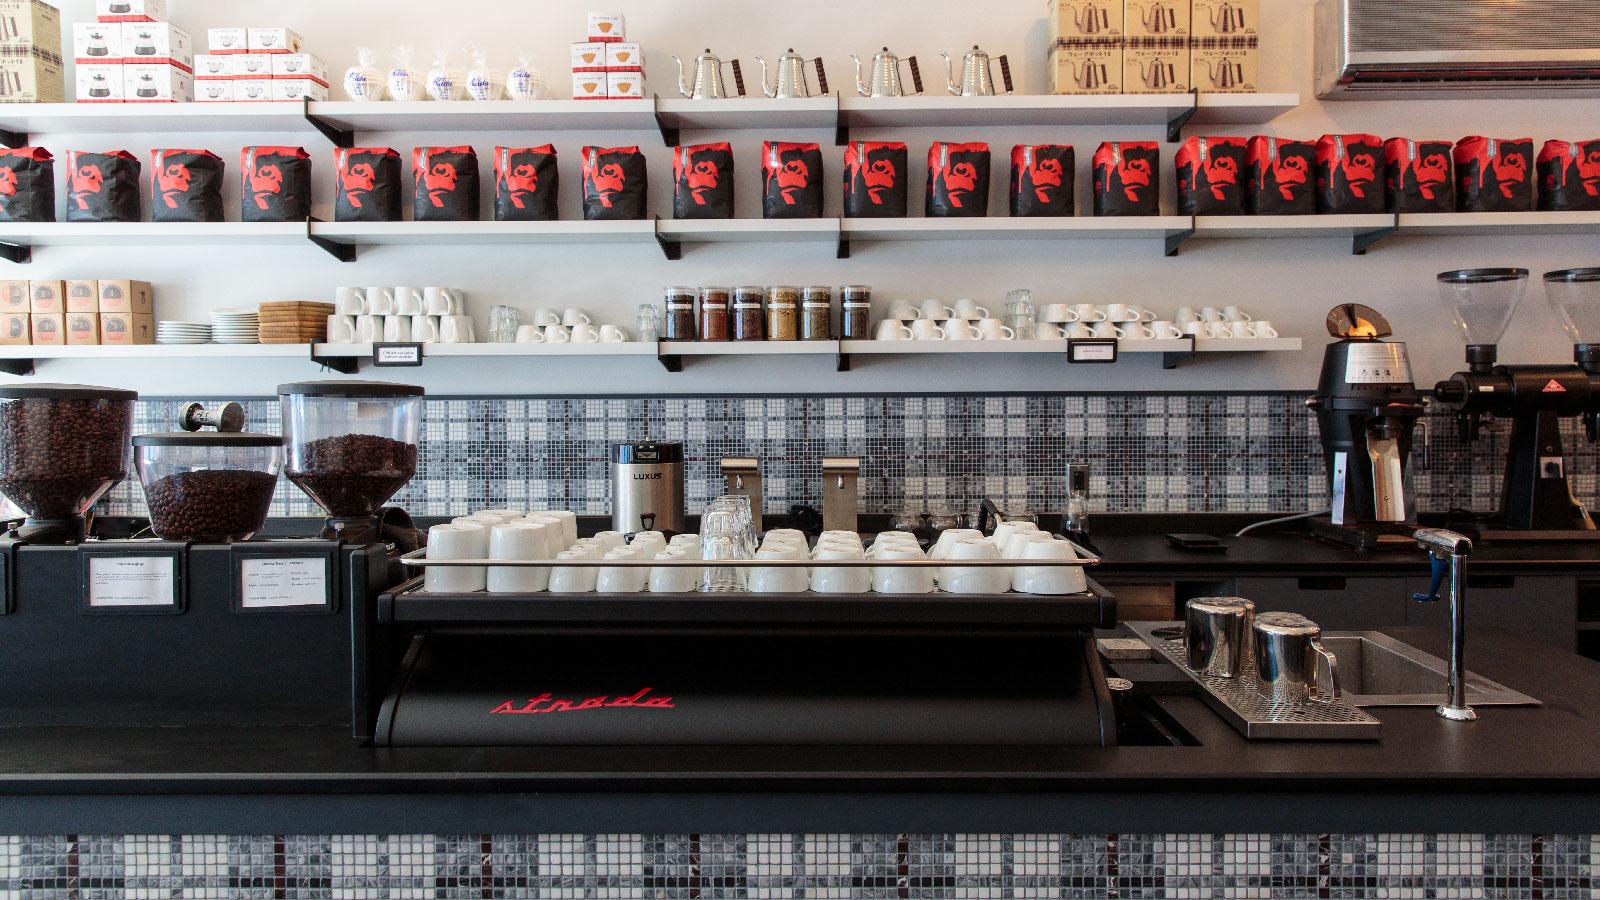 Mighty Morning Joe: Gorilla Coffee